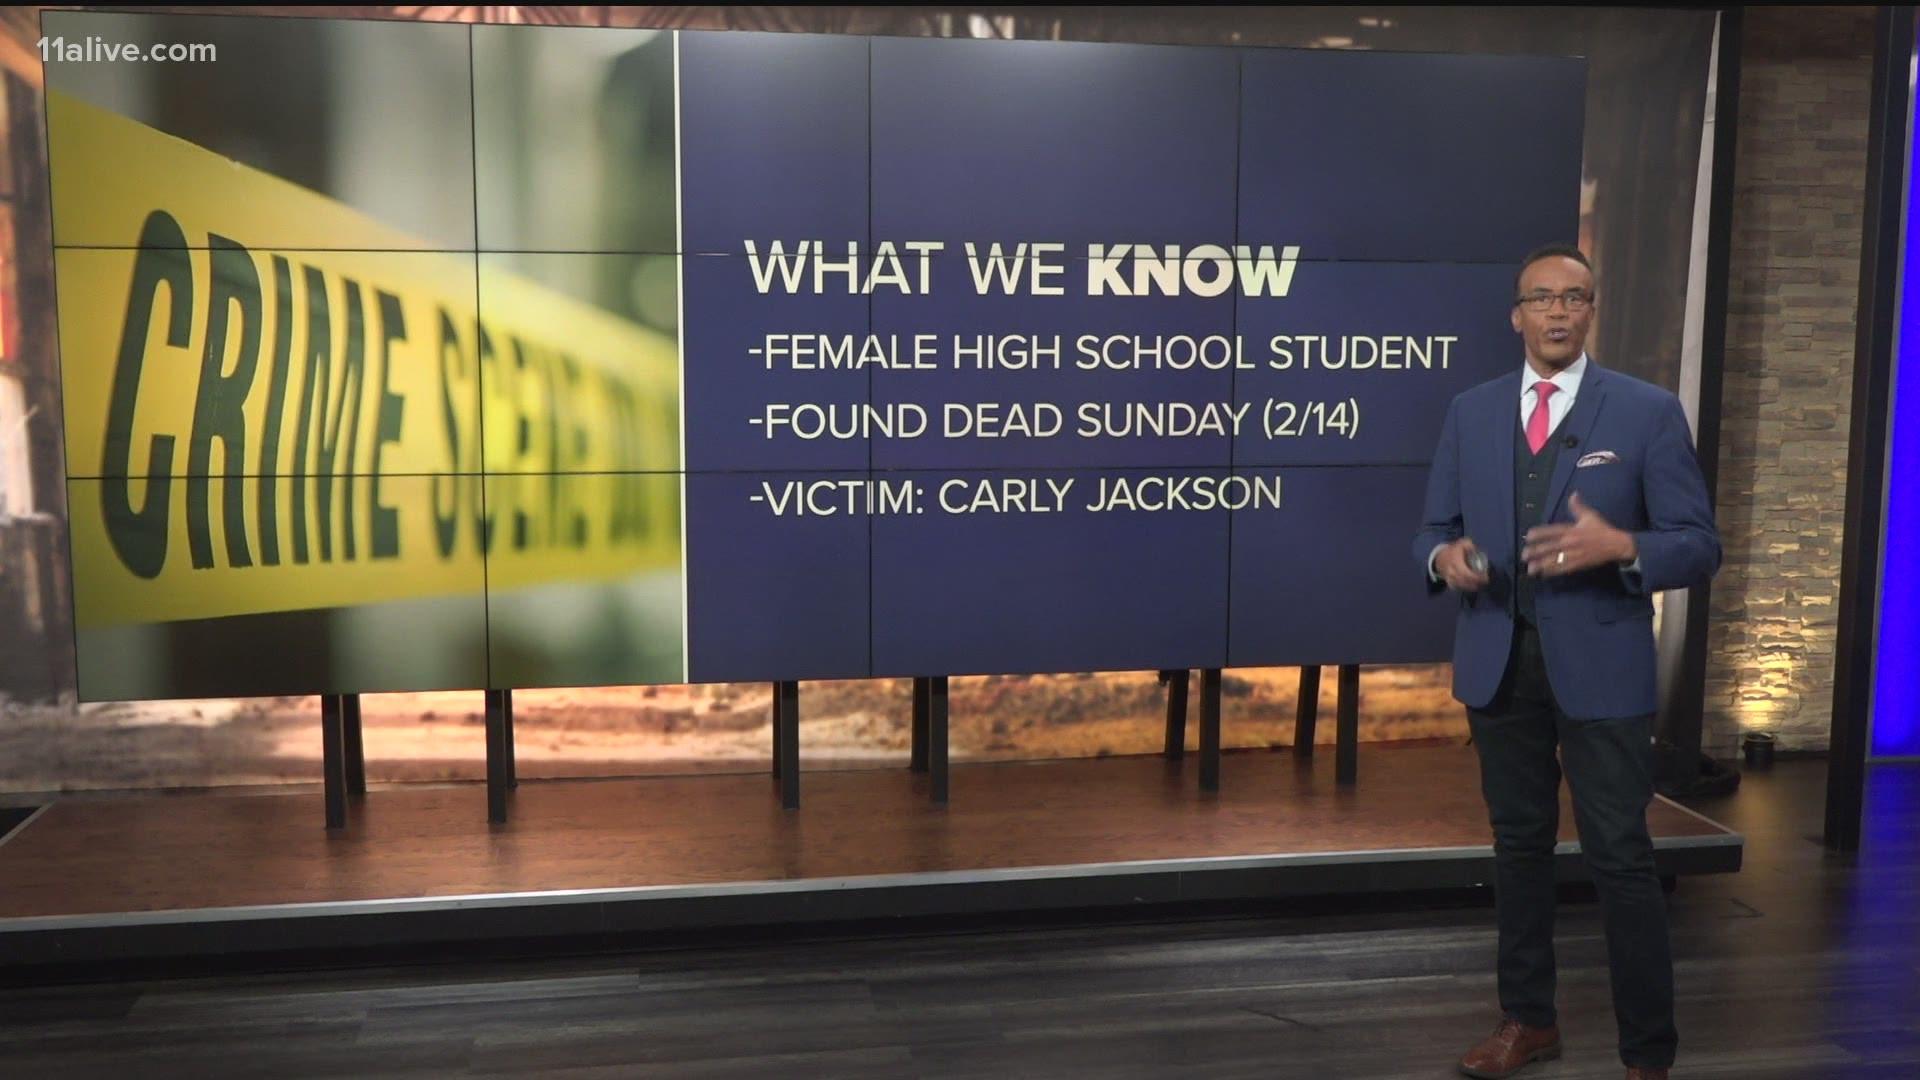 Johns Creek Death Investigation Of High School Student 11alive Com